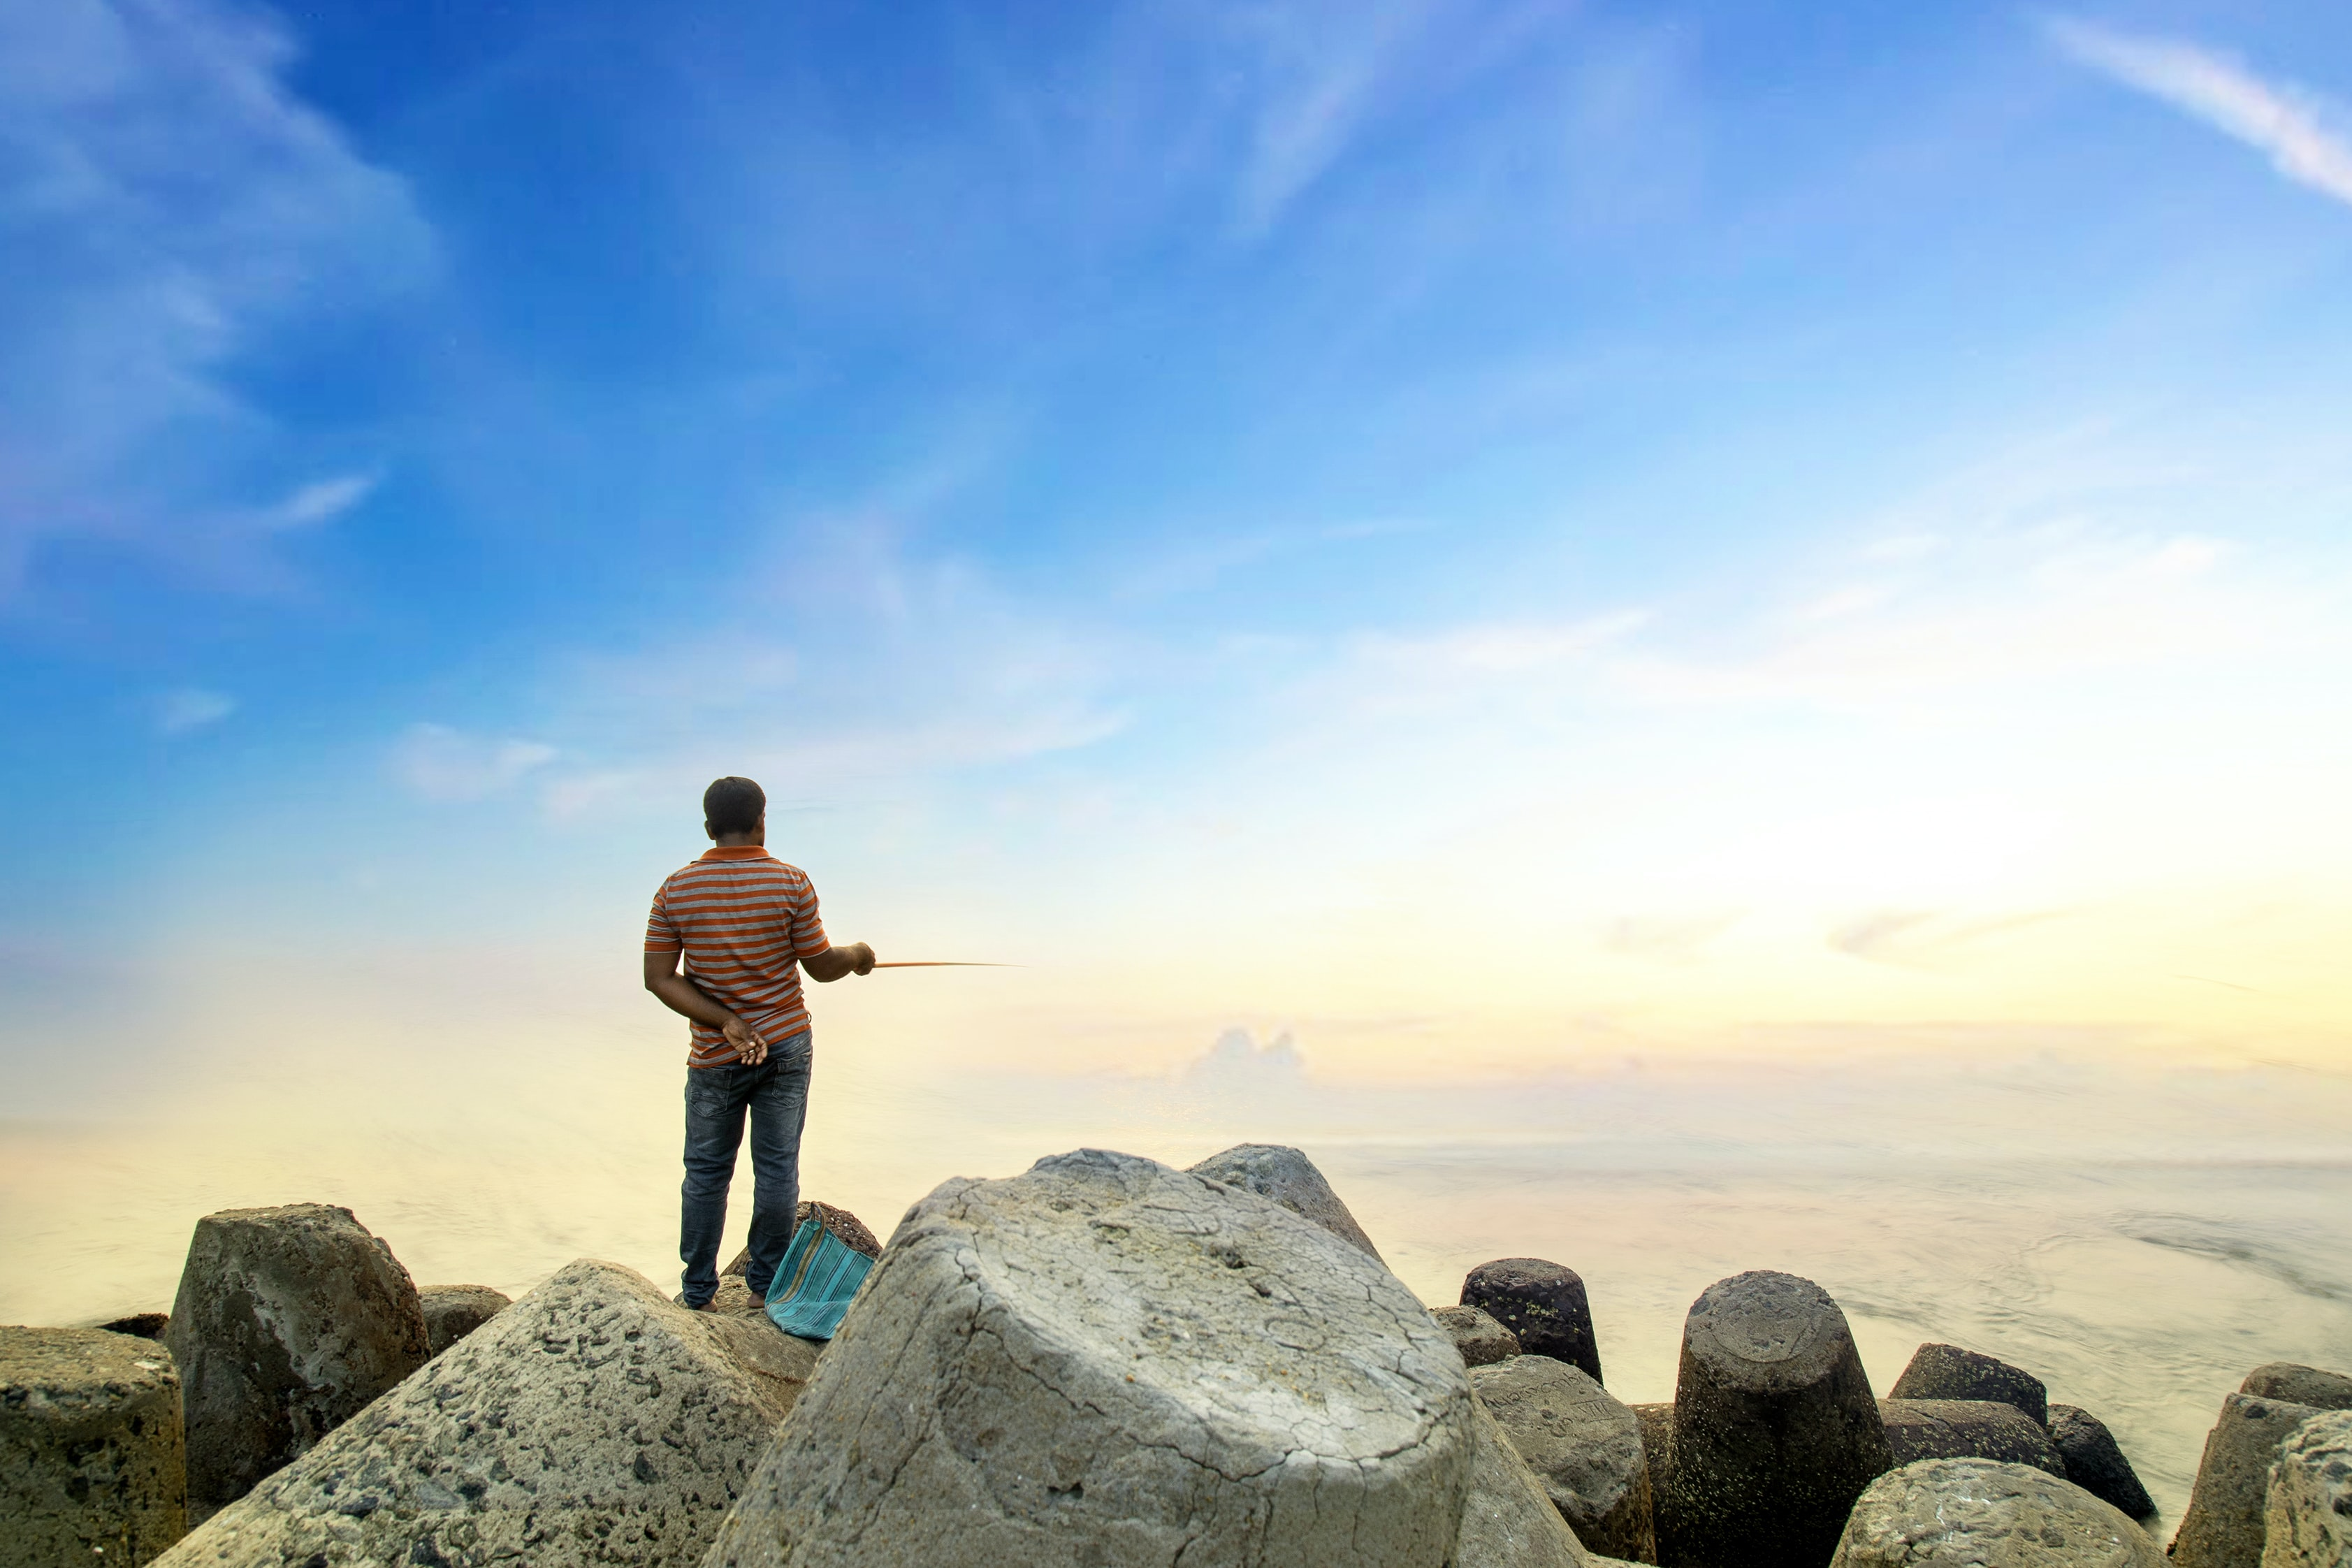 woman standing on big rocks overlooking body of water